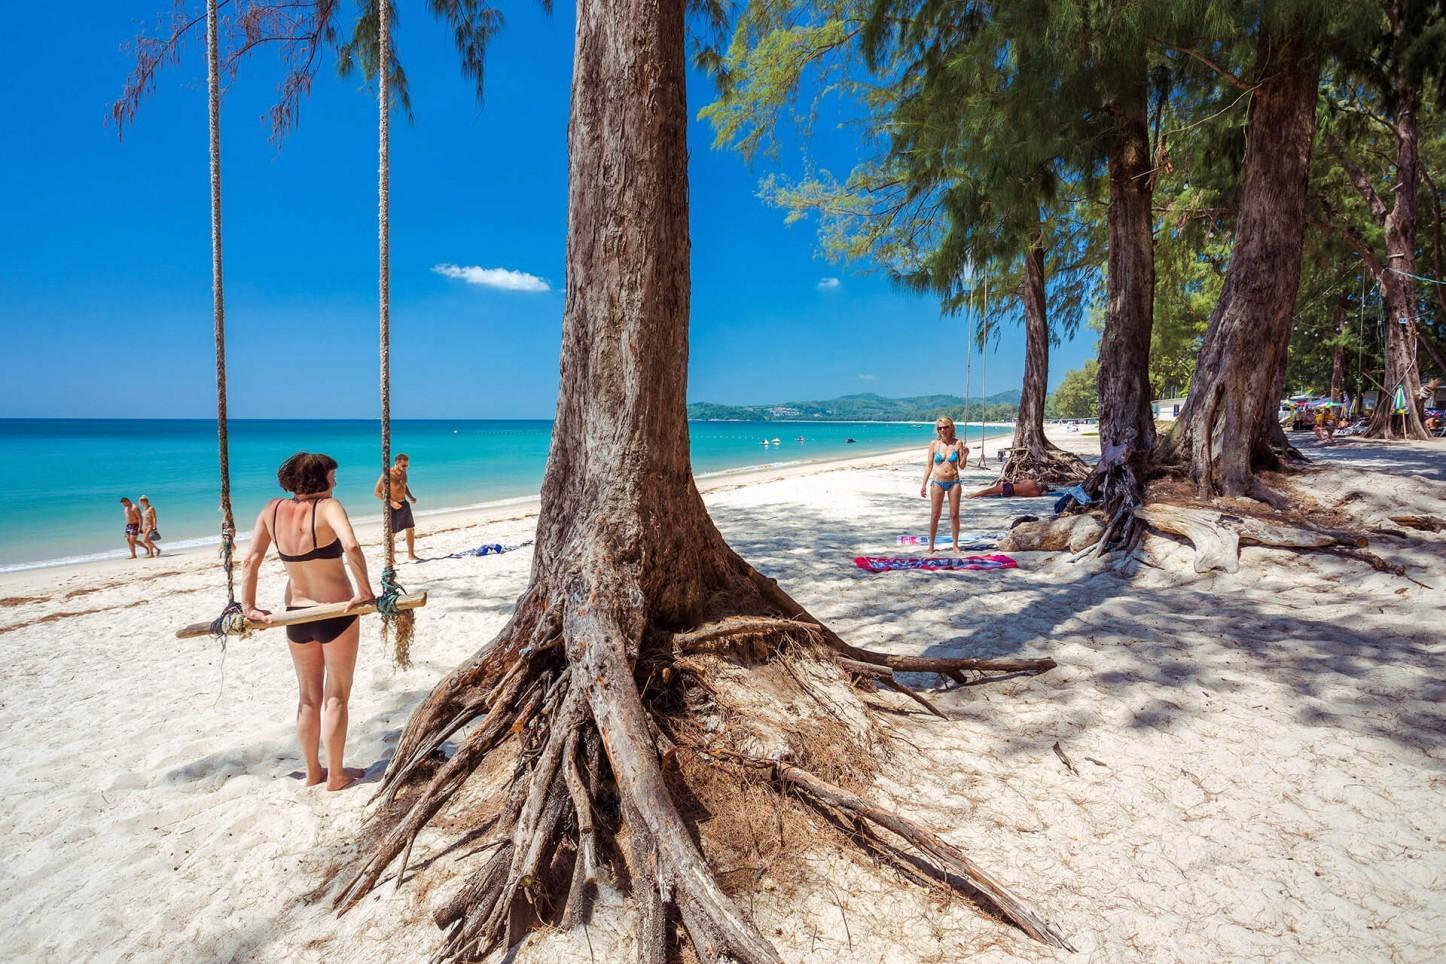 Bangtao beach, Phuket, Thailand